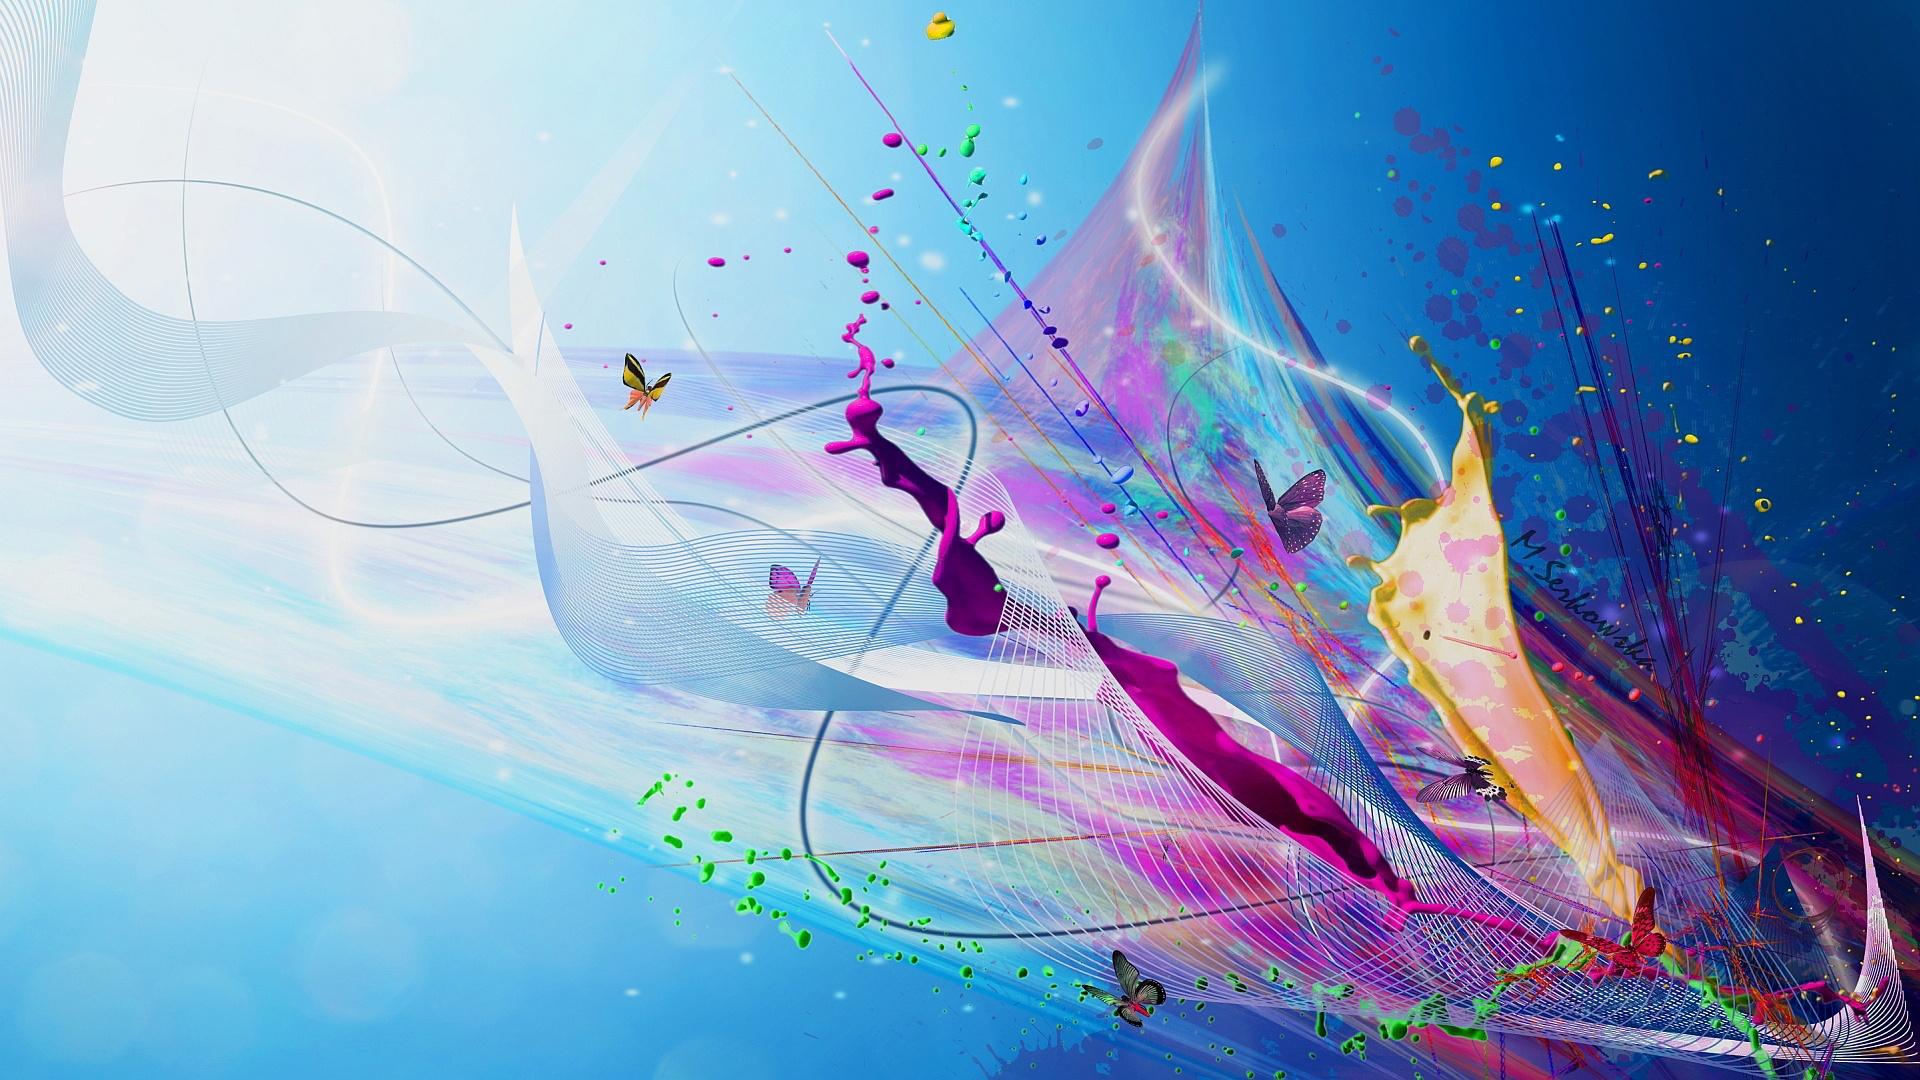 Paint Splash Windows 10 Wallpaper Abstract Hd 1920x1080